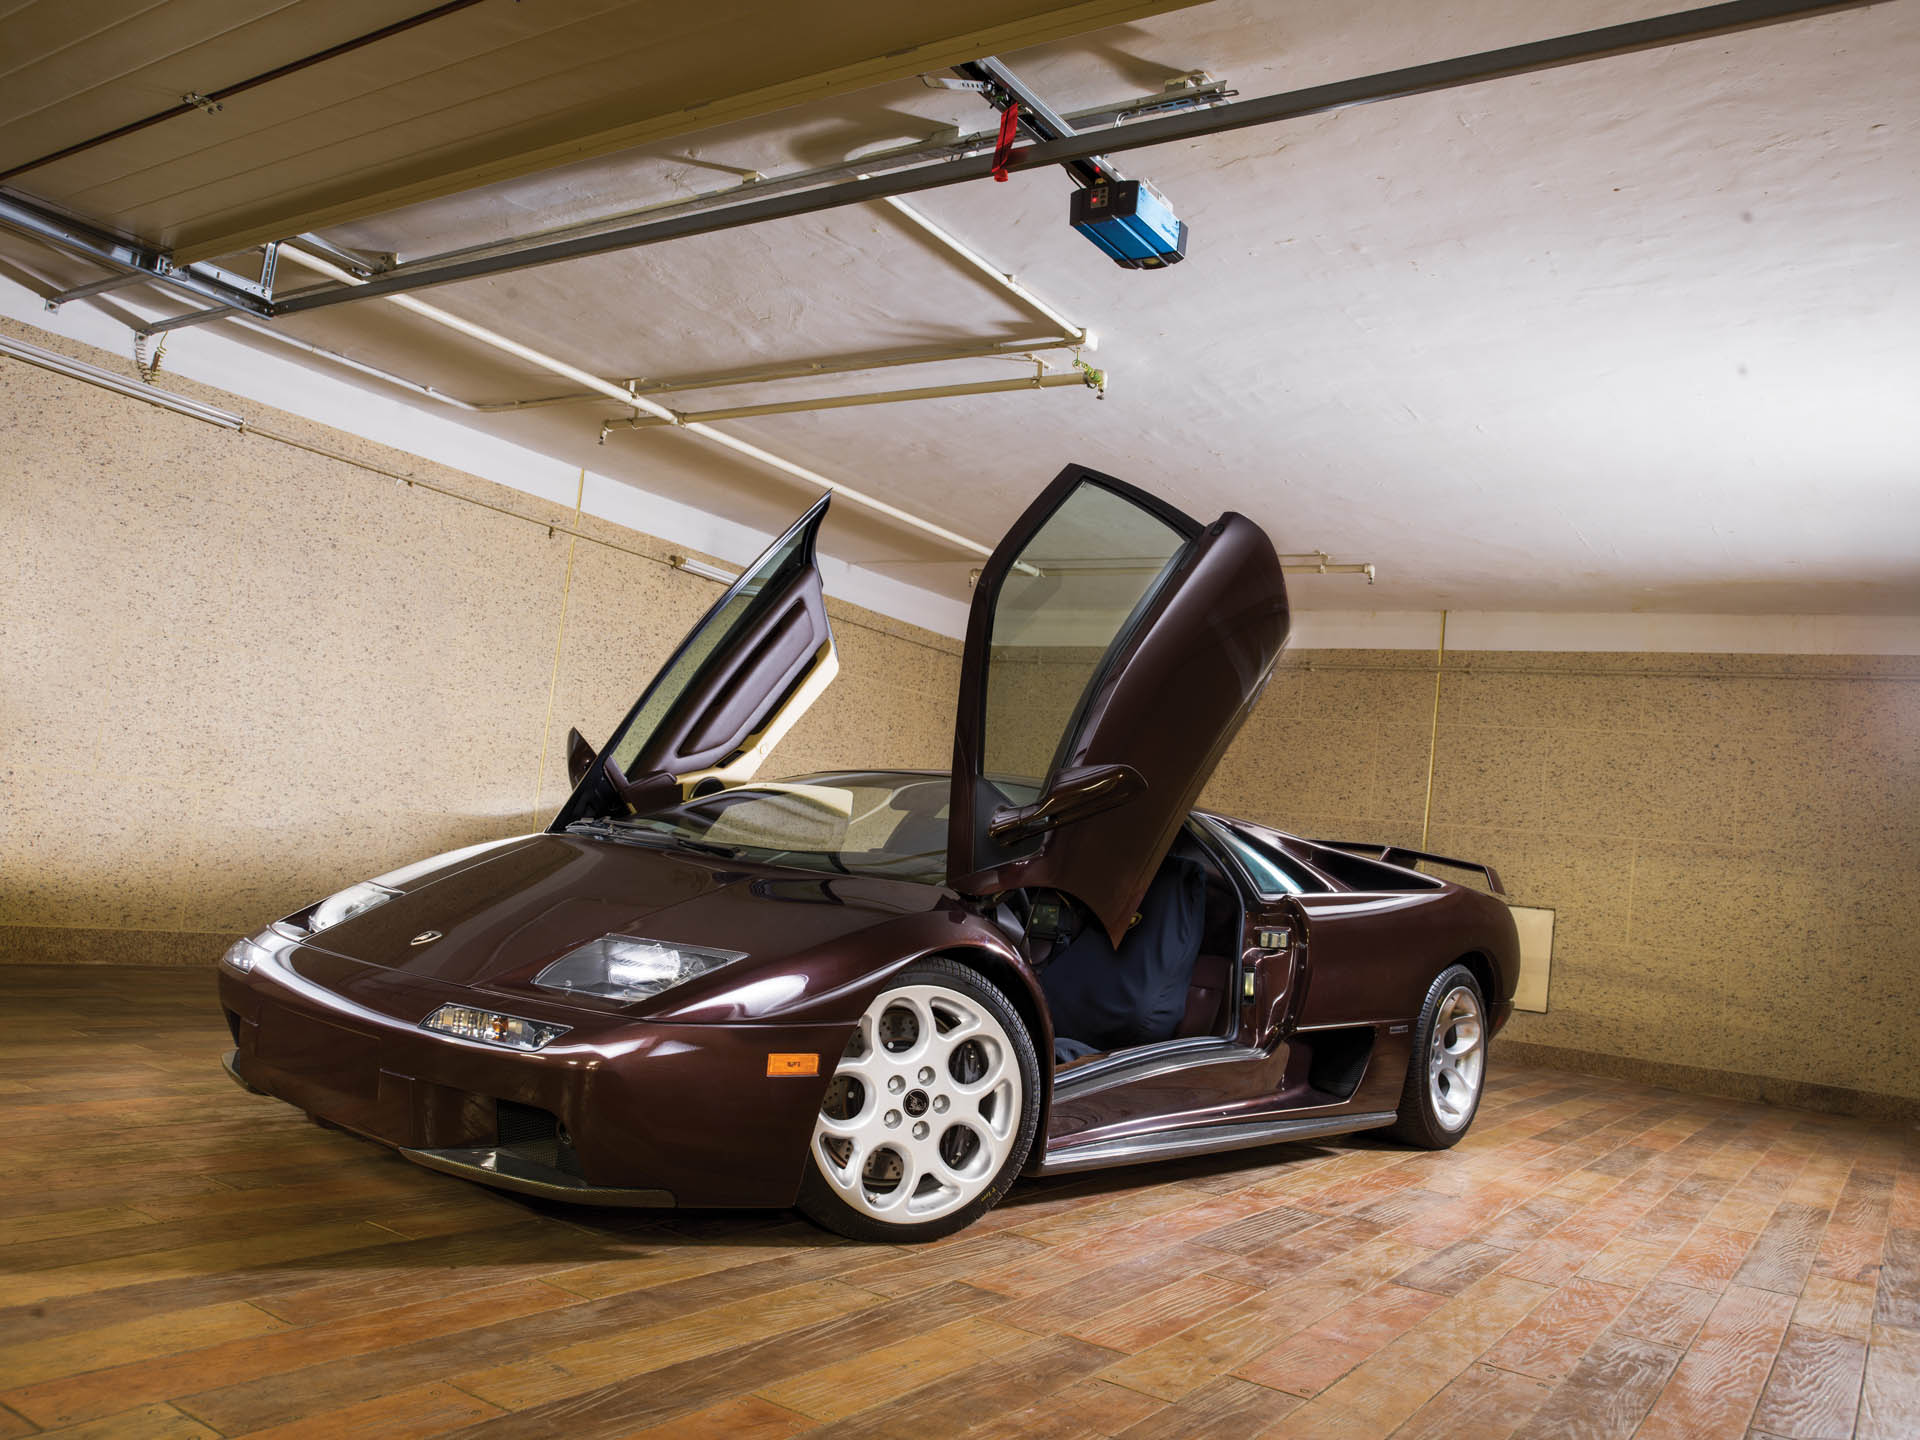 Lamborghini Diablo VT 6.0 SE for sale (1)